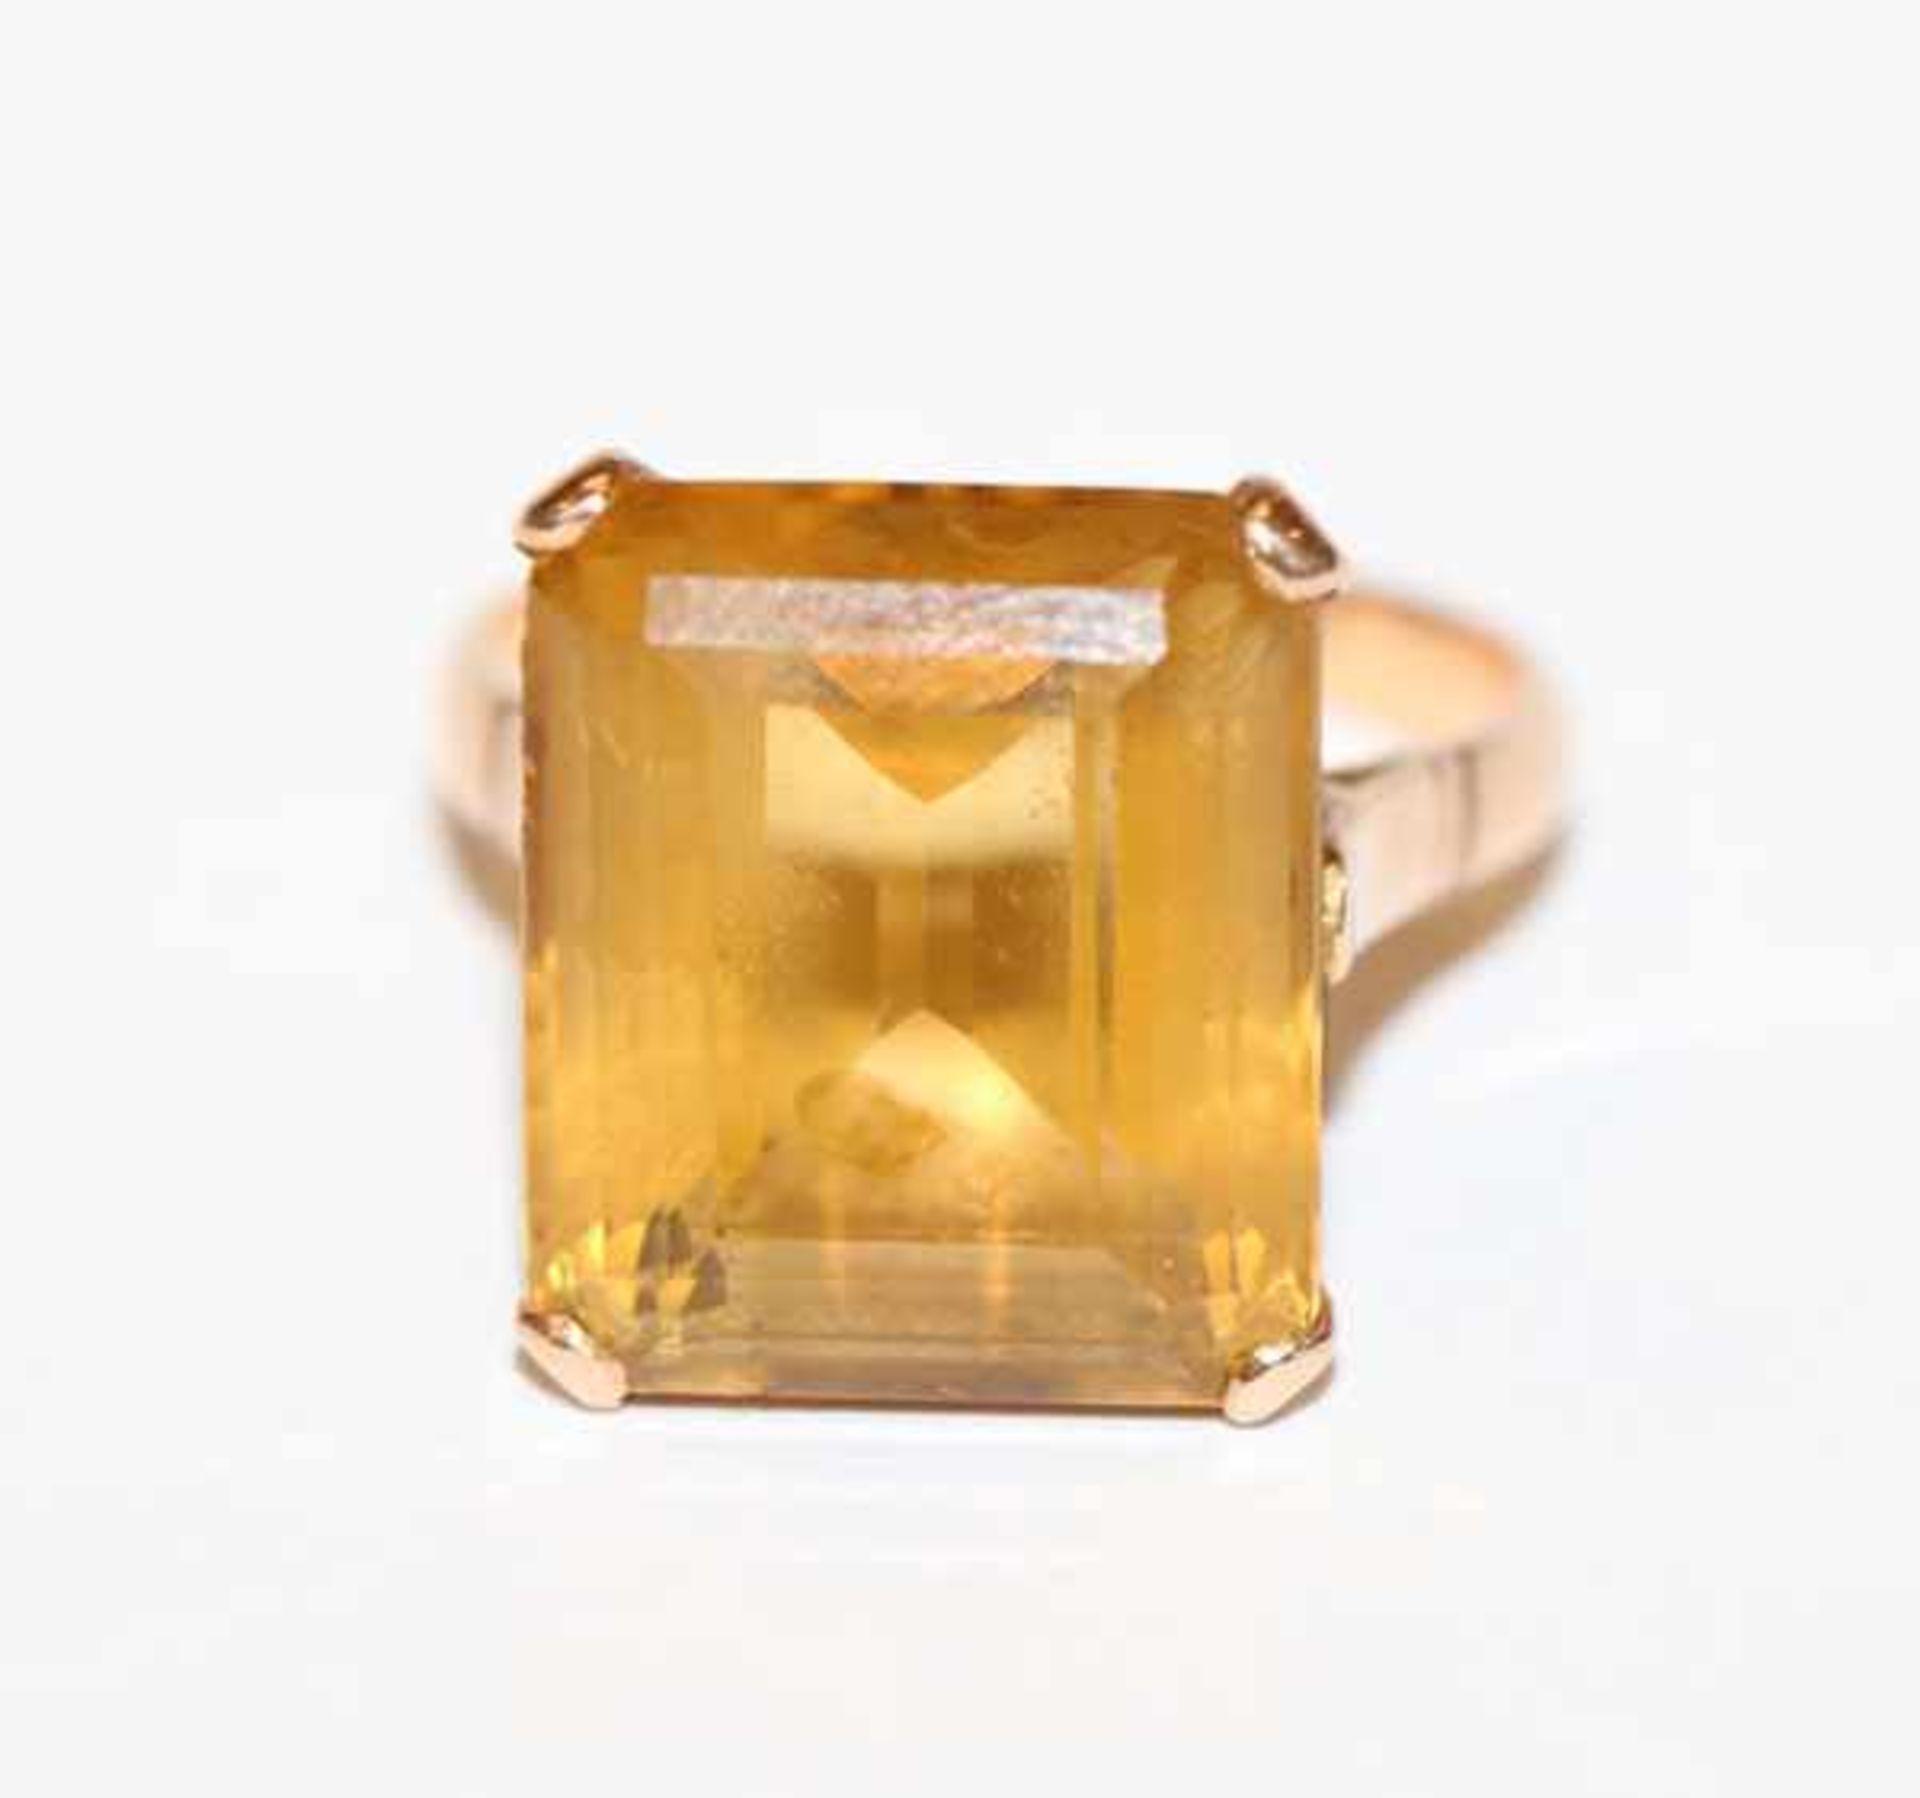 Los 24 - 14 k Gelbgold (geprüft) Ring mit Topas, Gr. 52, 5,6 gr.